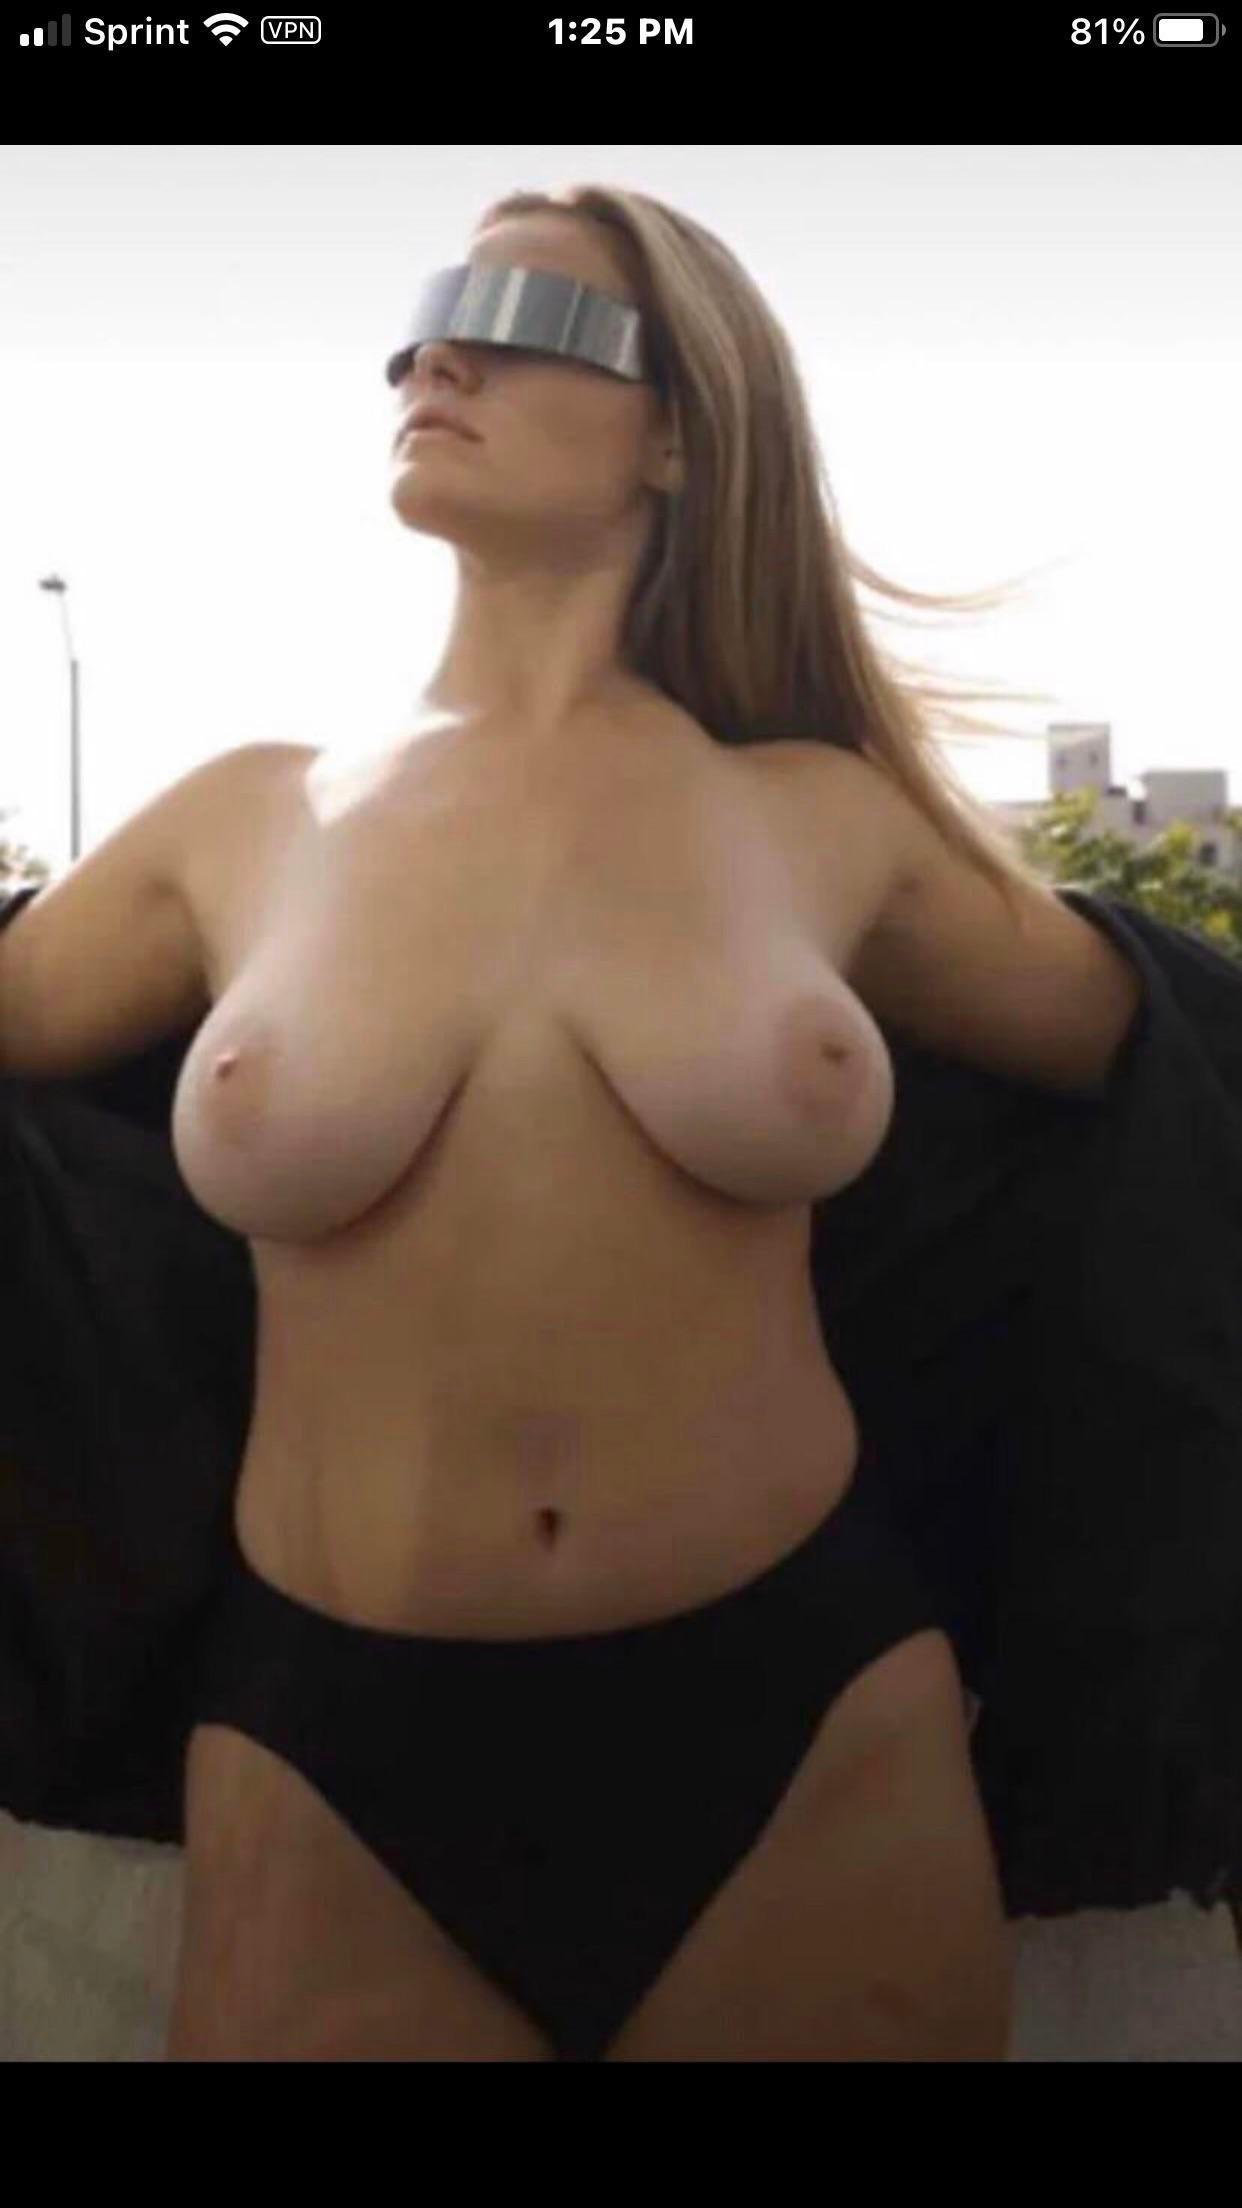 Megan Guthrie Nude Leaked 0024